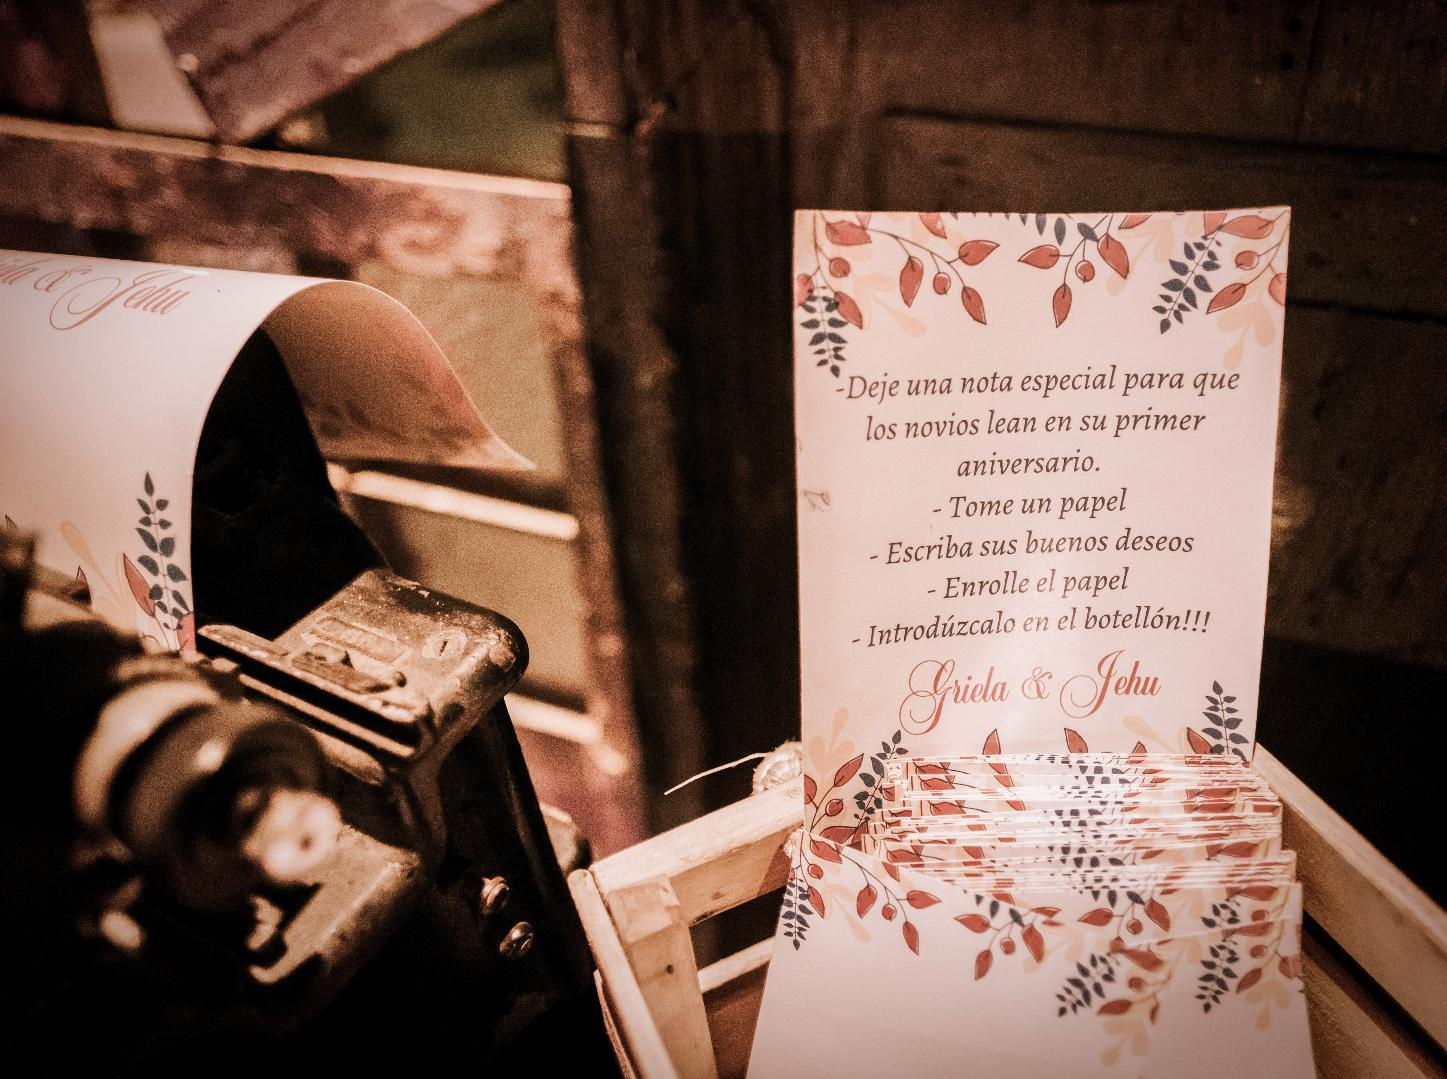 bodas-sin-clasificar-sin-tema-cuba-29512.jpg